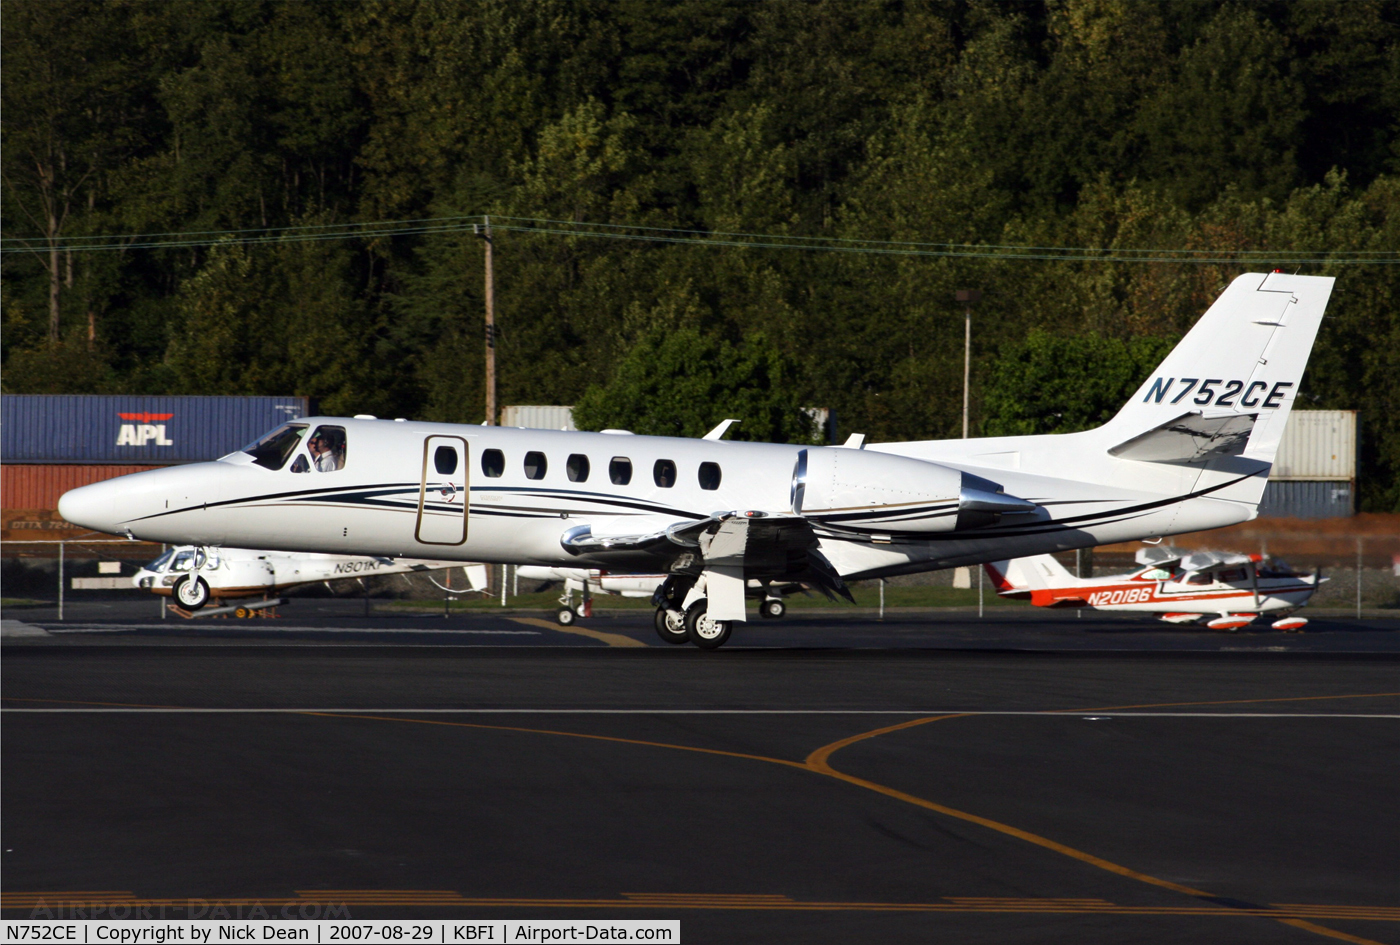 N752CE, 2007 Cessna 560 C/N 560-0752, KBFI